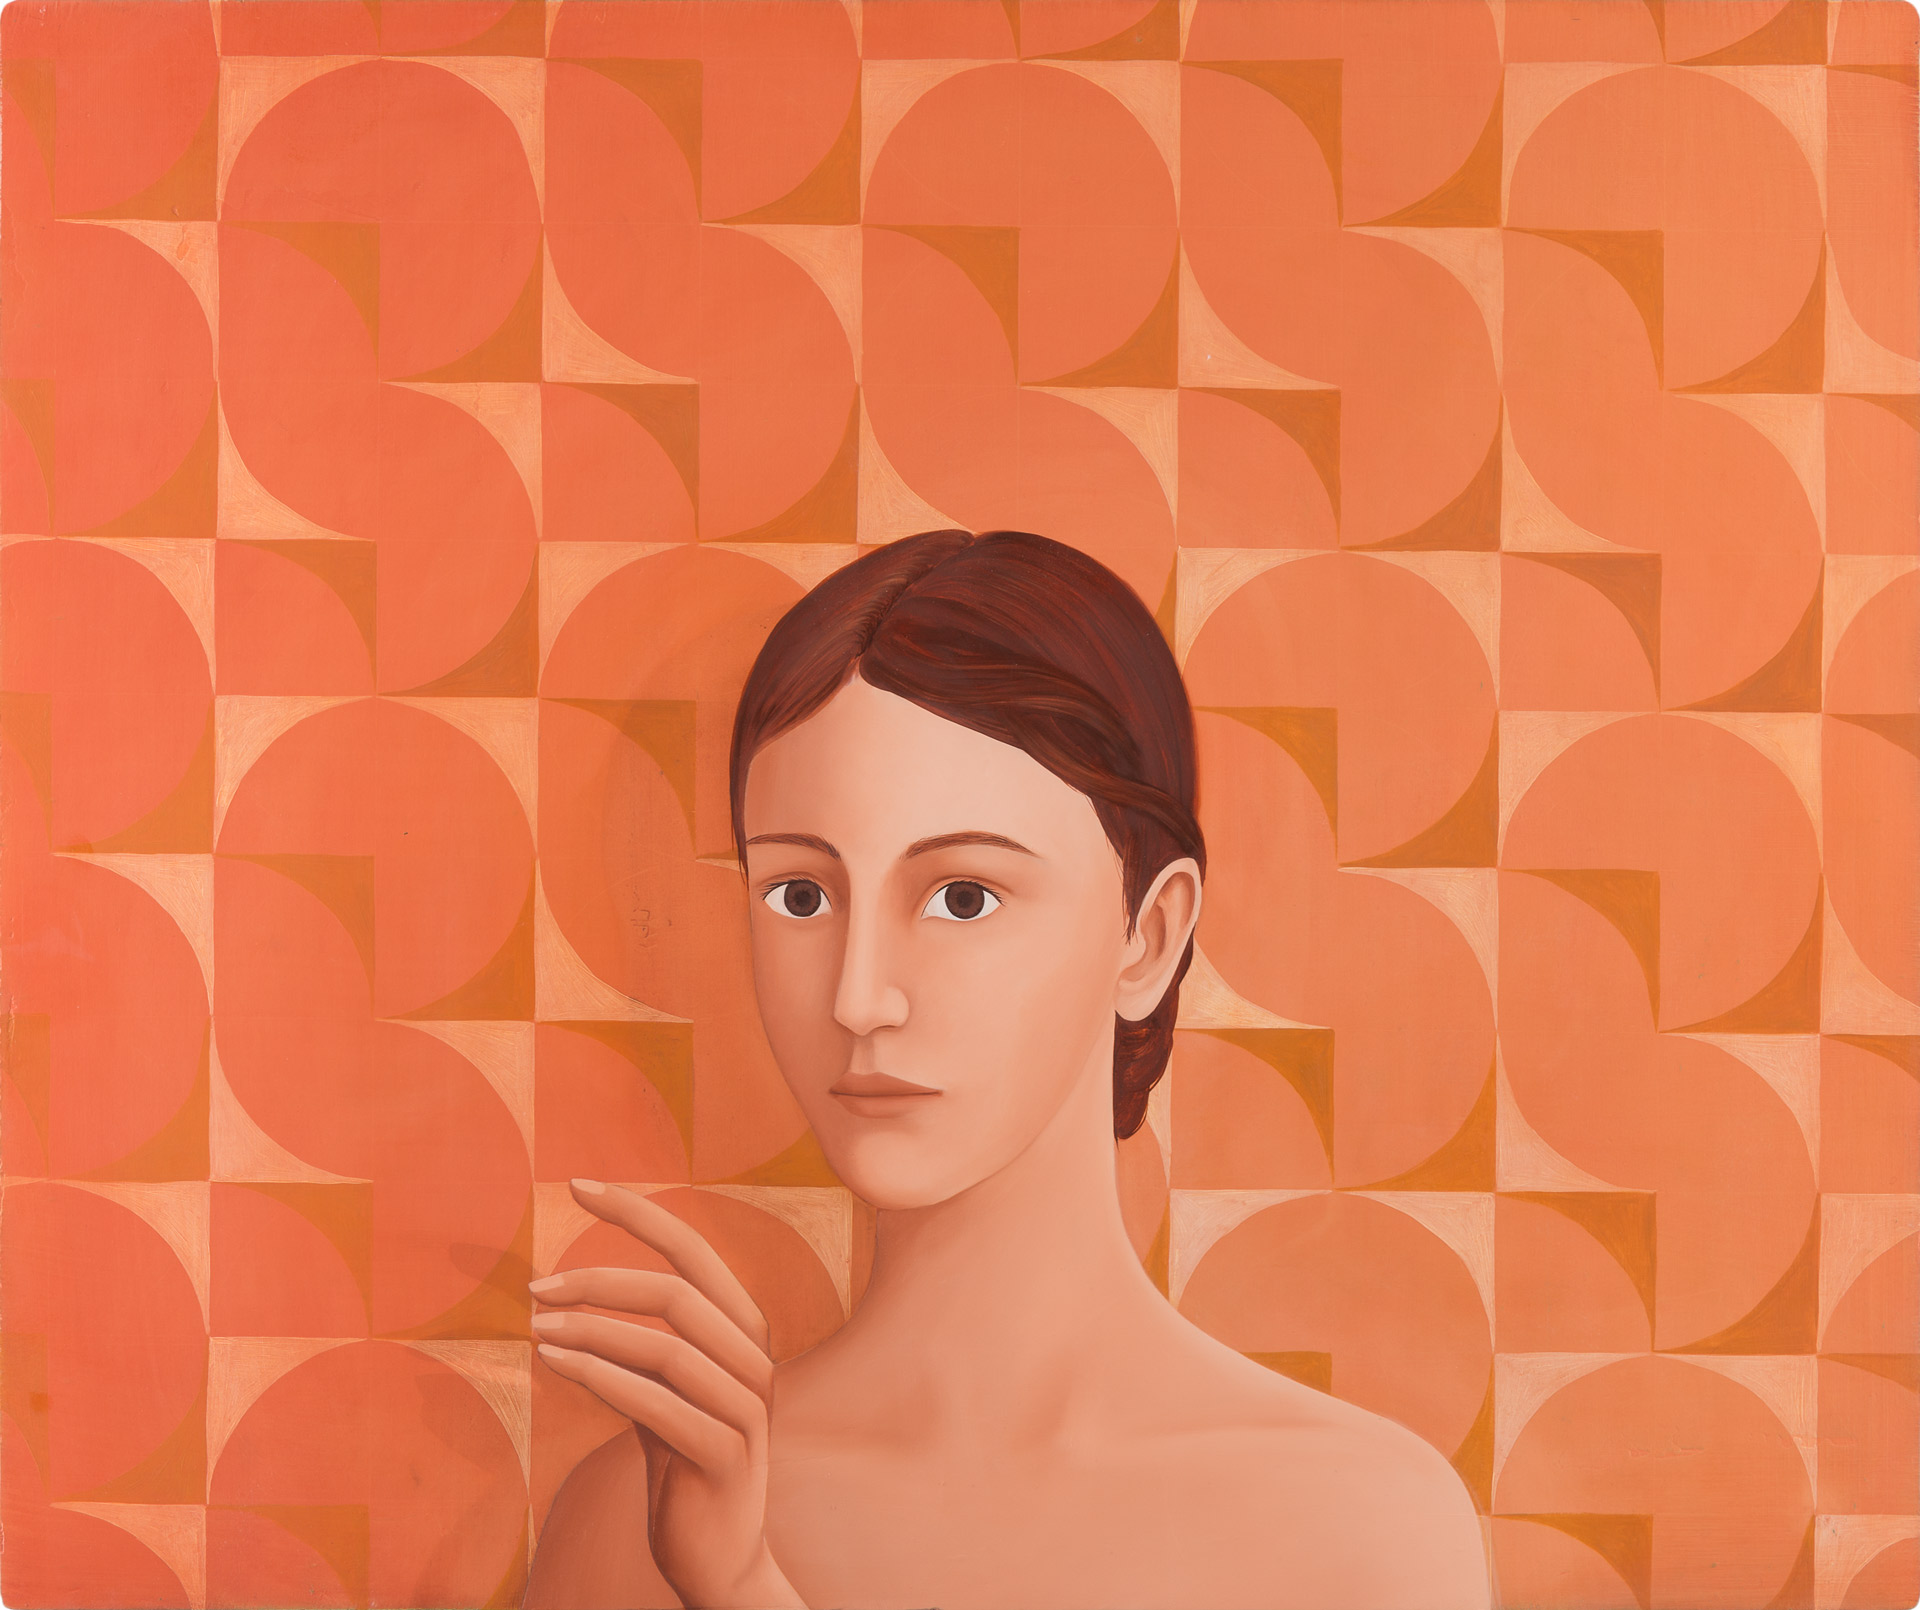 Untitled/50 x 60 cm, Oil on wood/2019